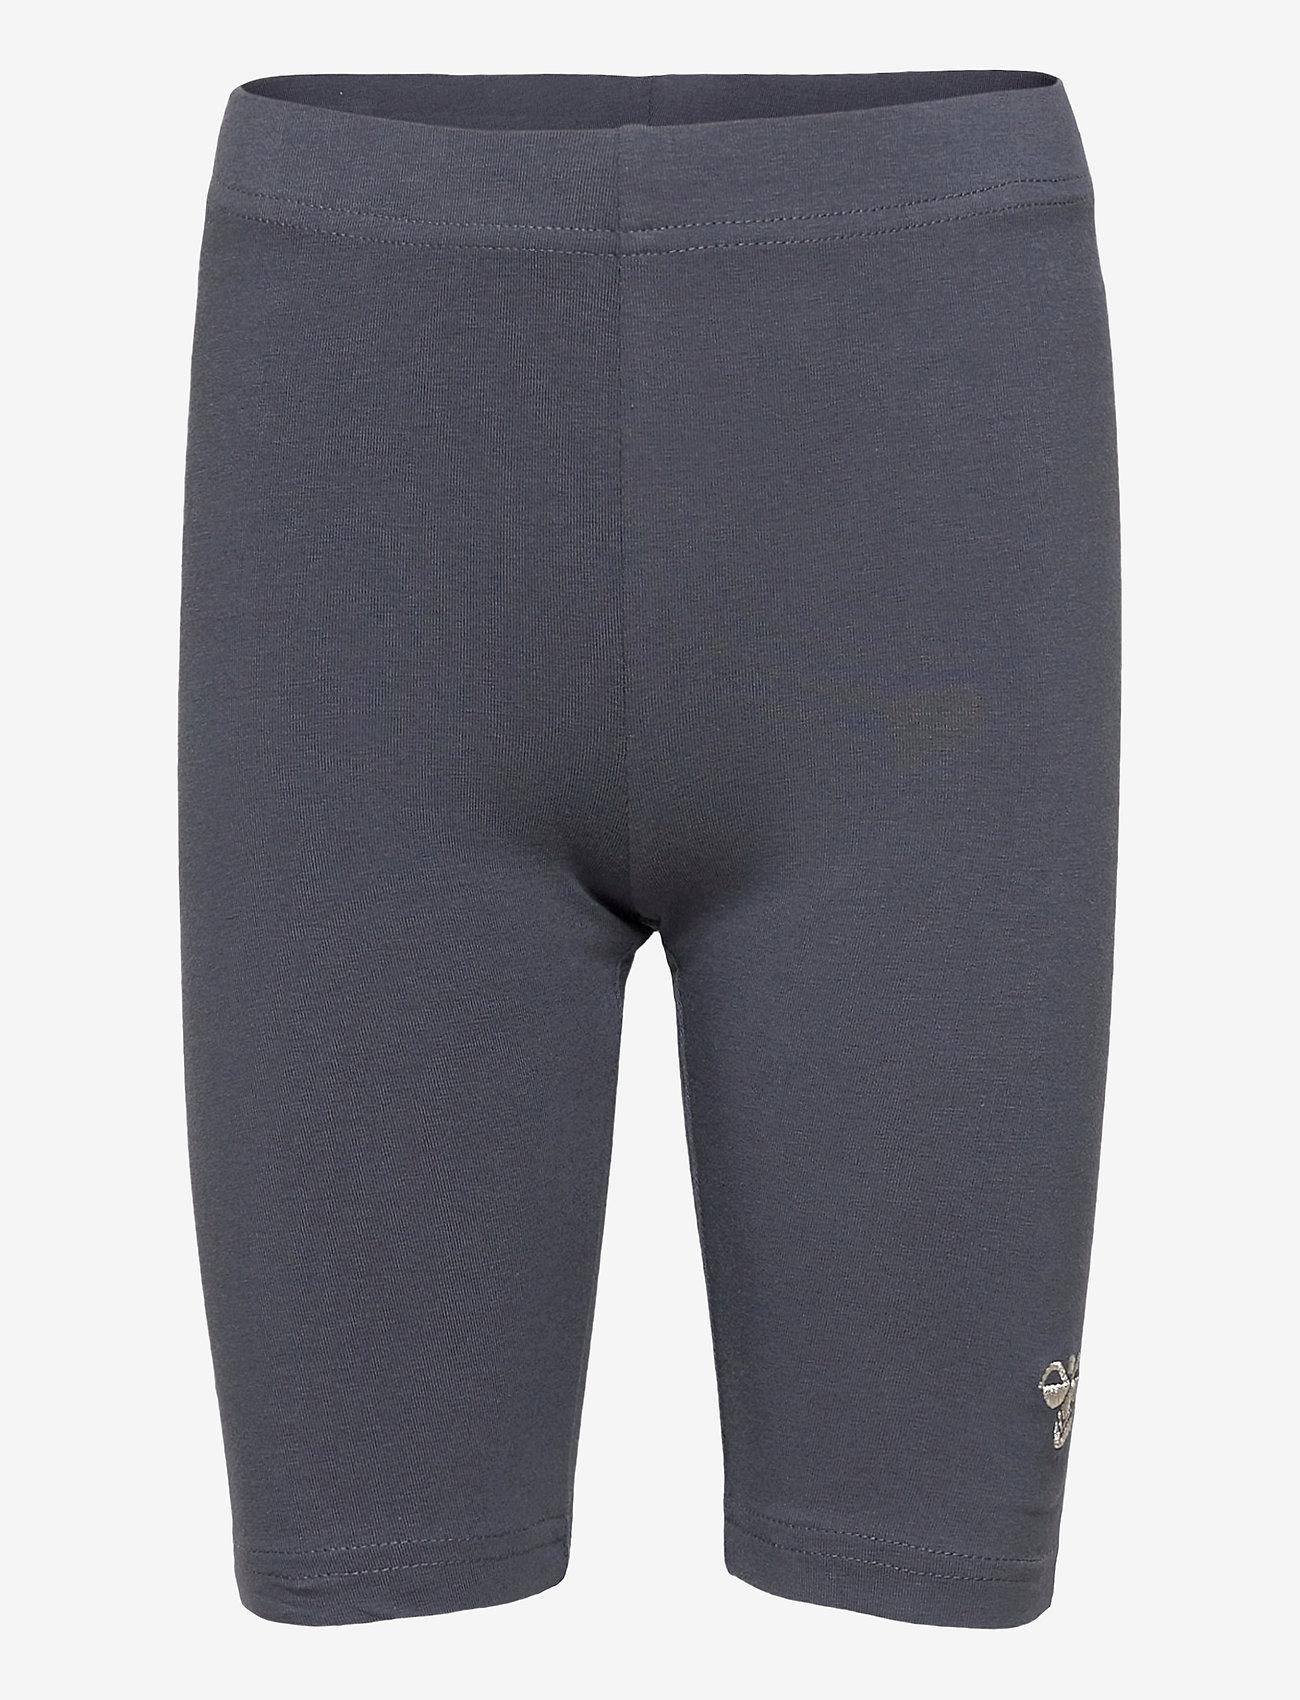 Hummel - hmlMINNIE SHORTS - leggings - ombre blue - 0